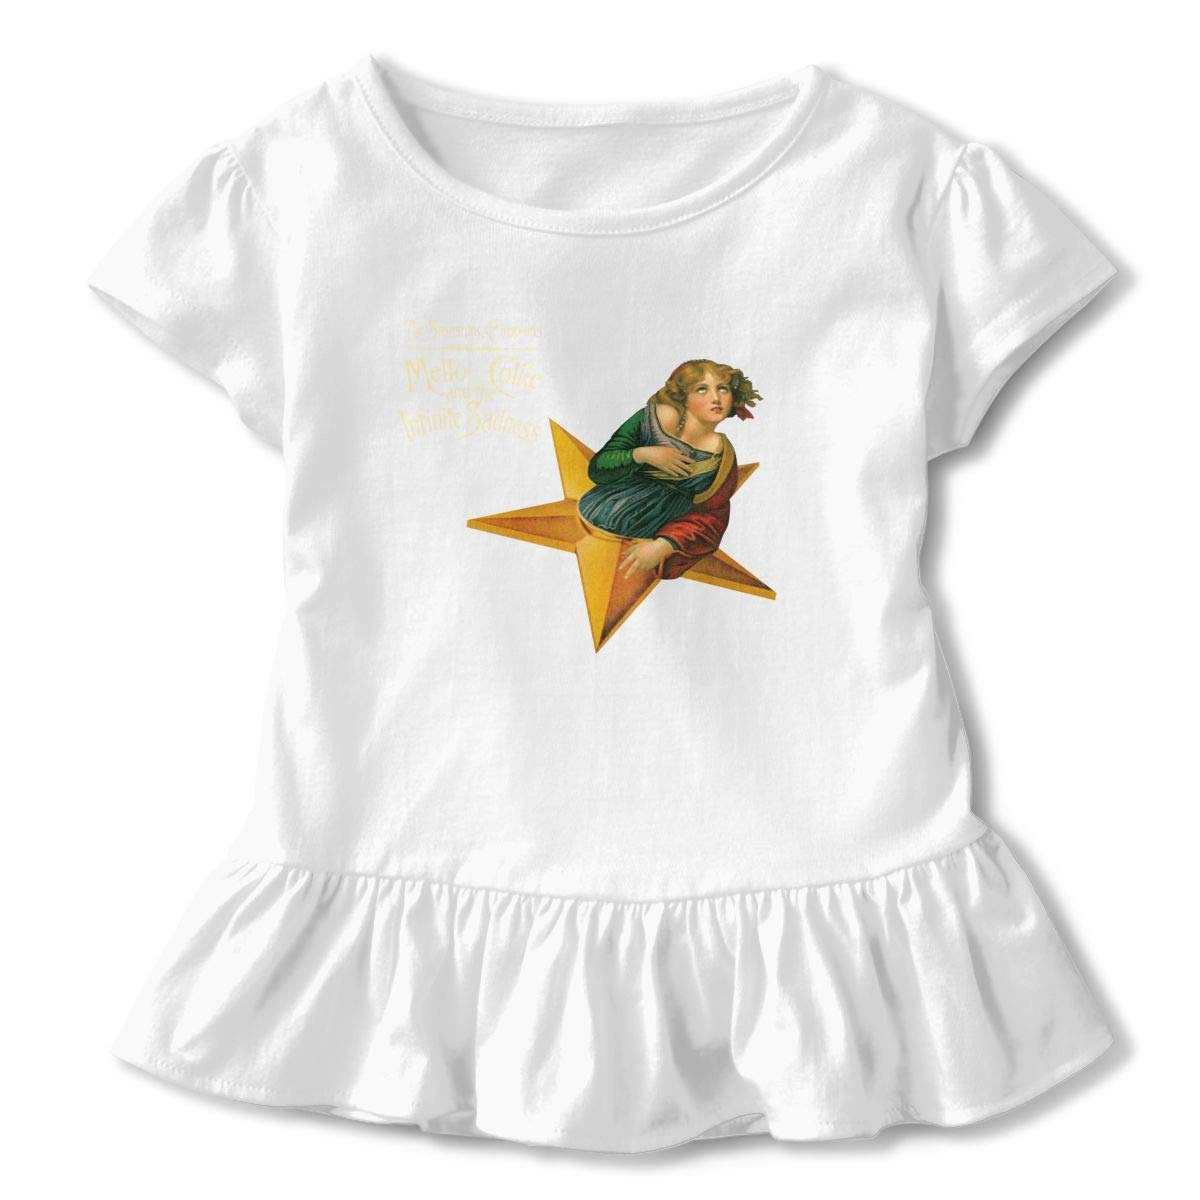 Kid T Shirt Smashing Pumpkins Music Band 3D Tee Baseball Ruffle Short Sleeve Cotton Shirts Top for Girls Kids